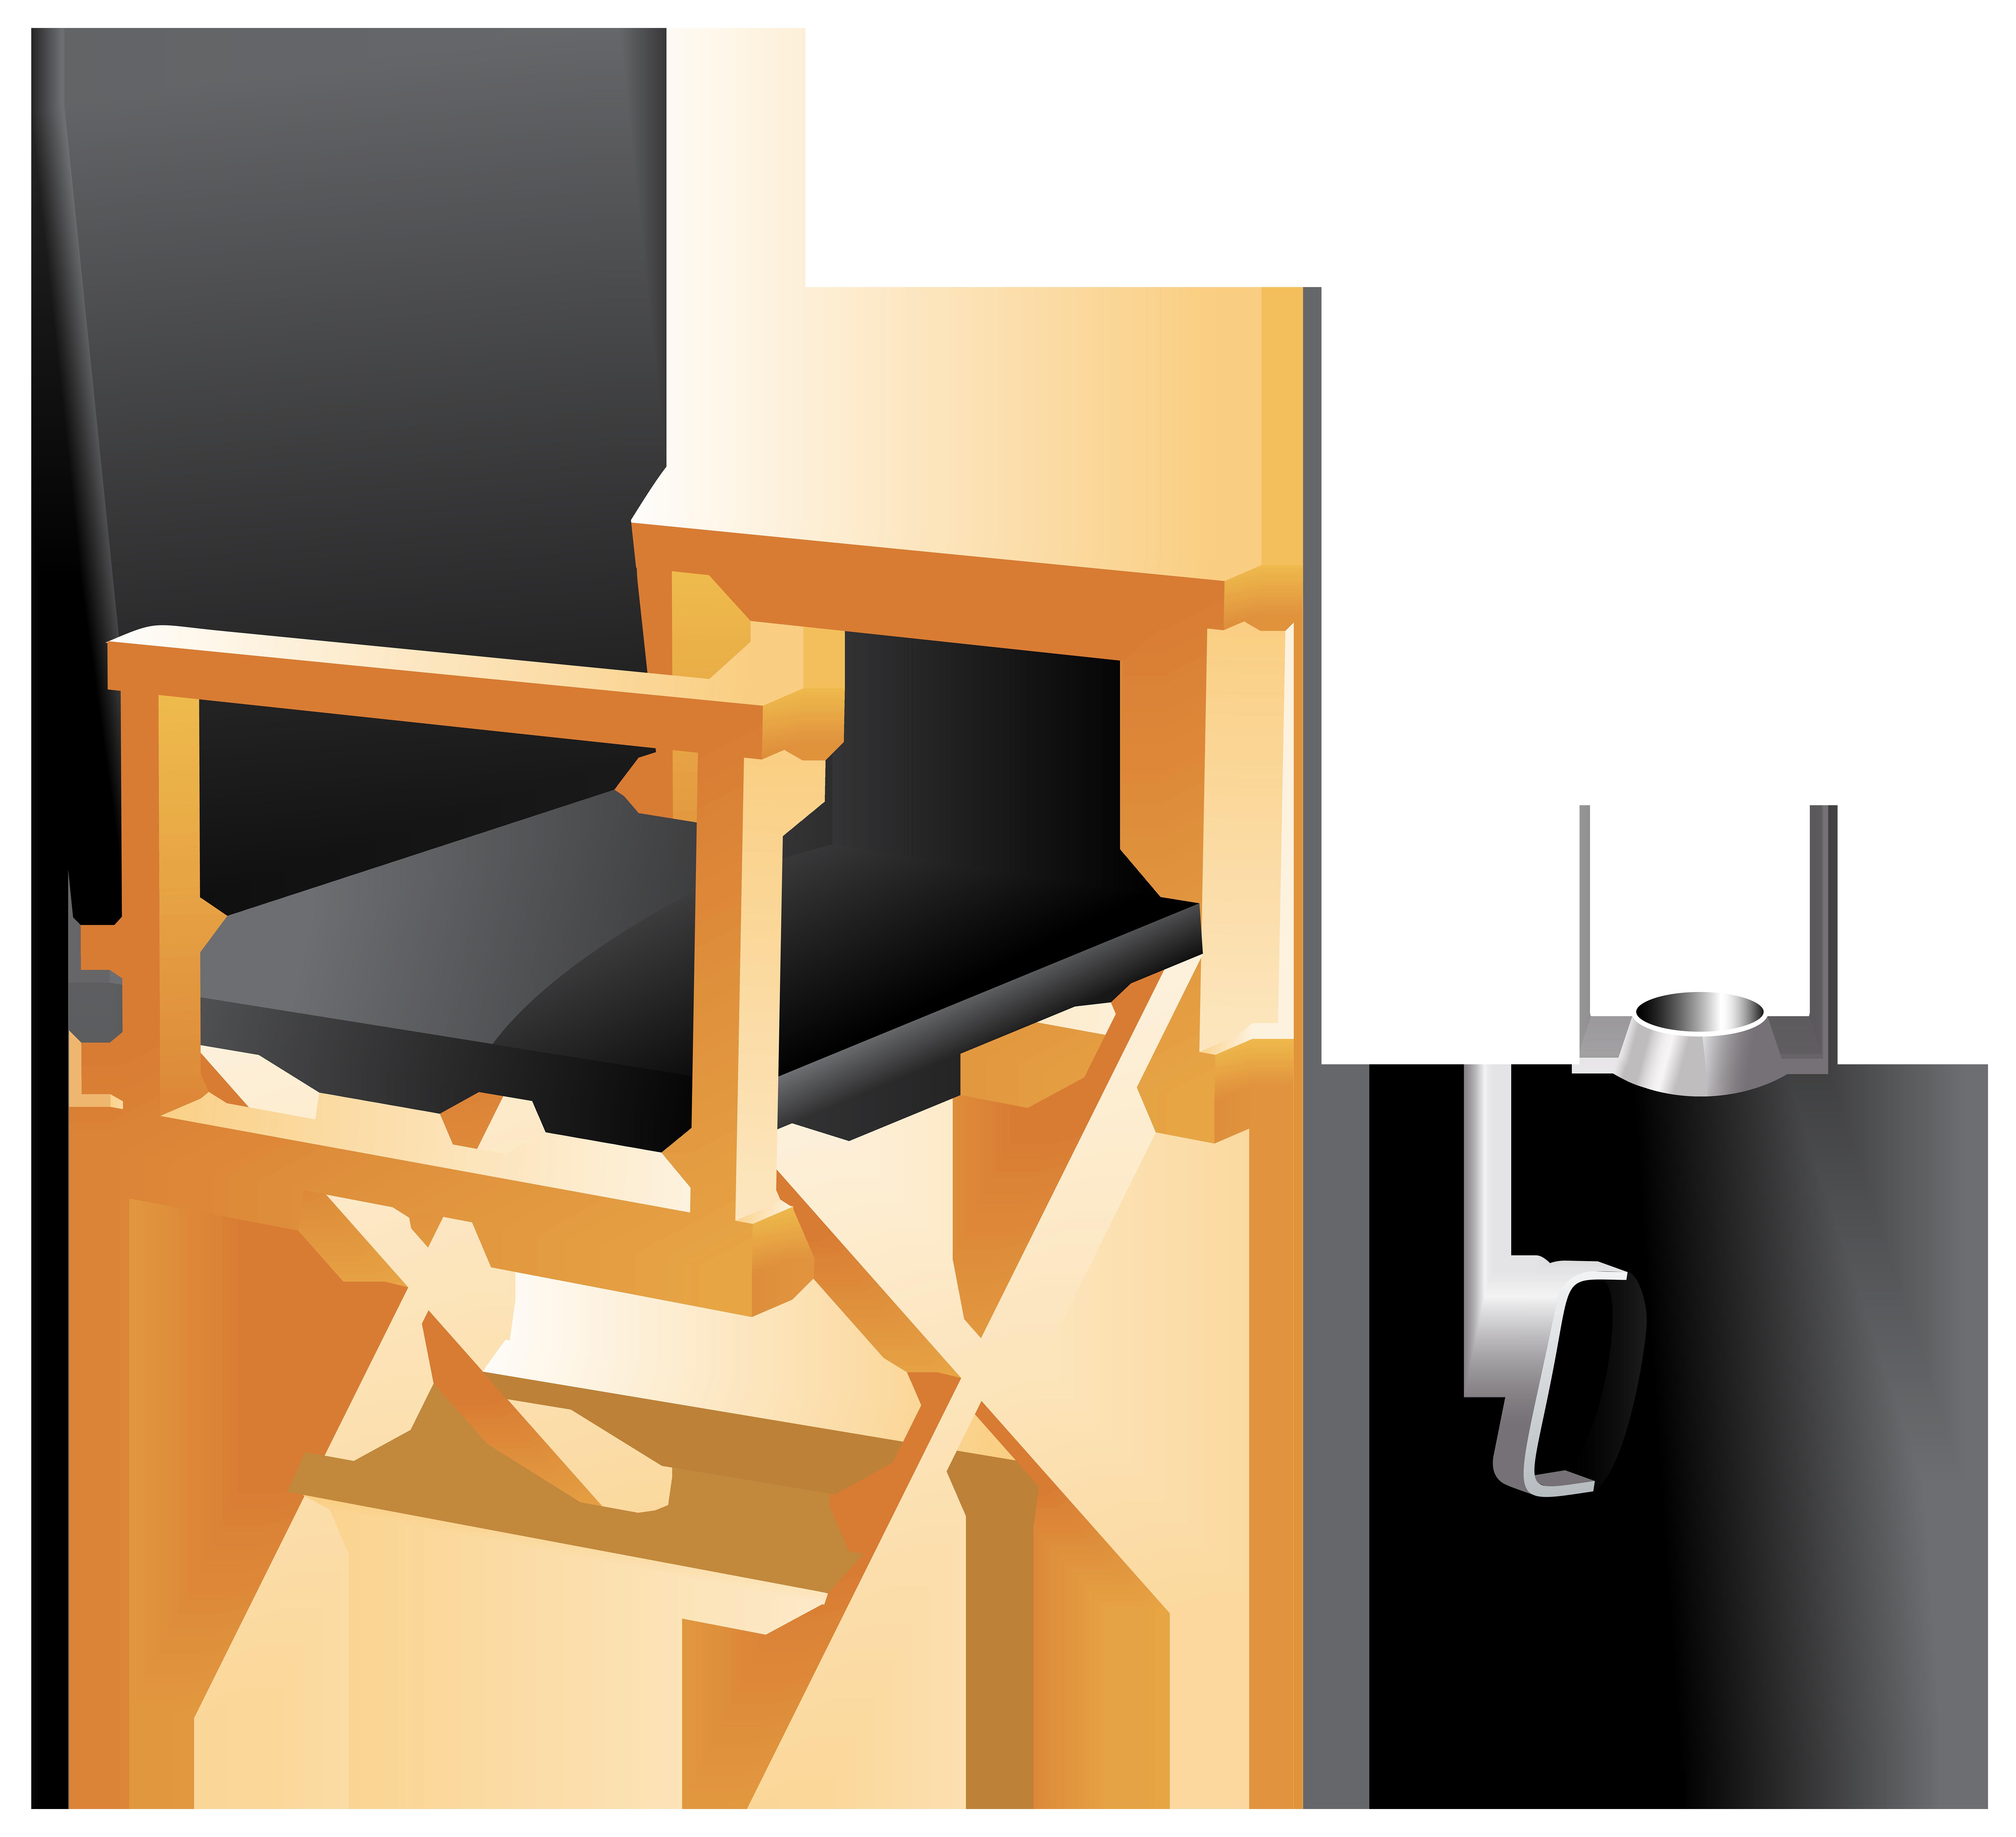 clipart transparent stock Chair clipart. Directors and megaphone png